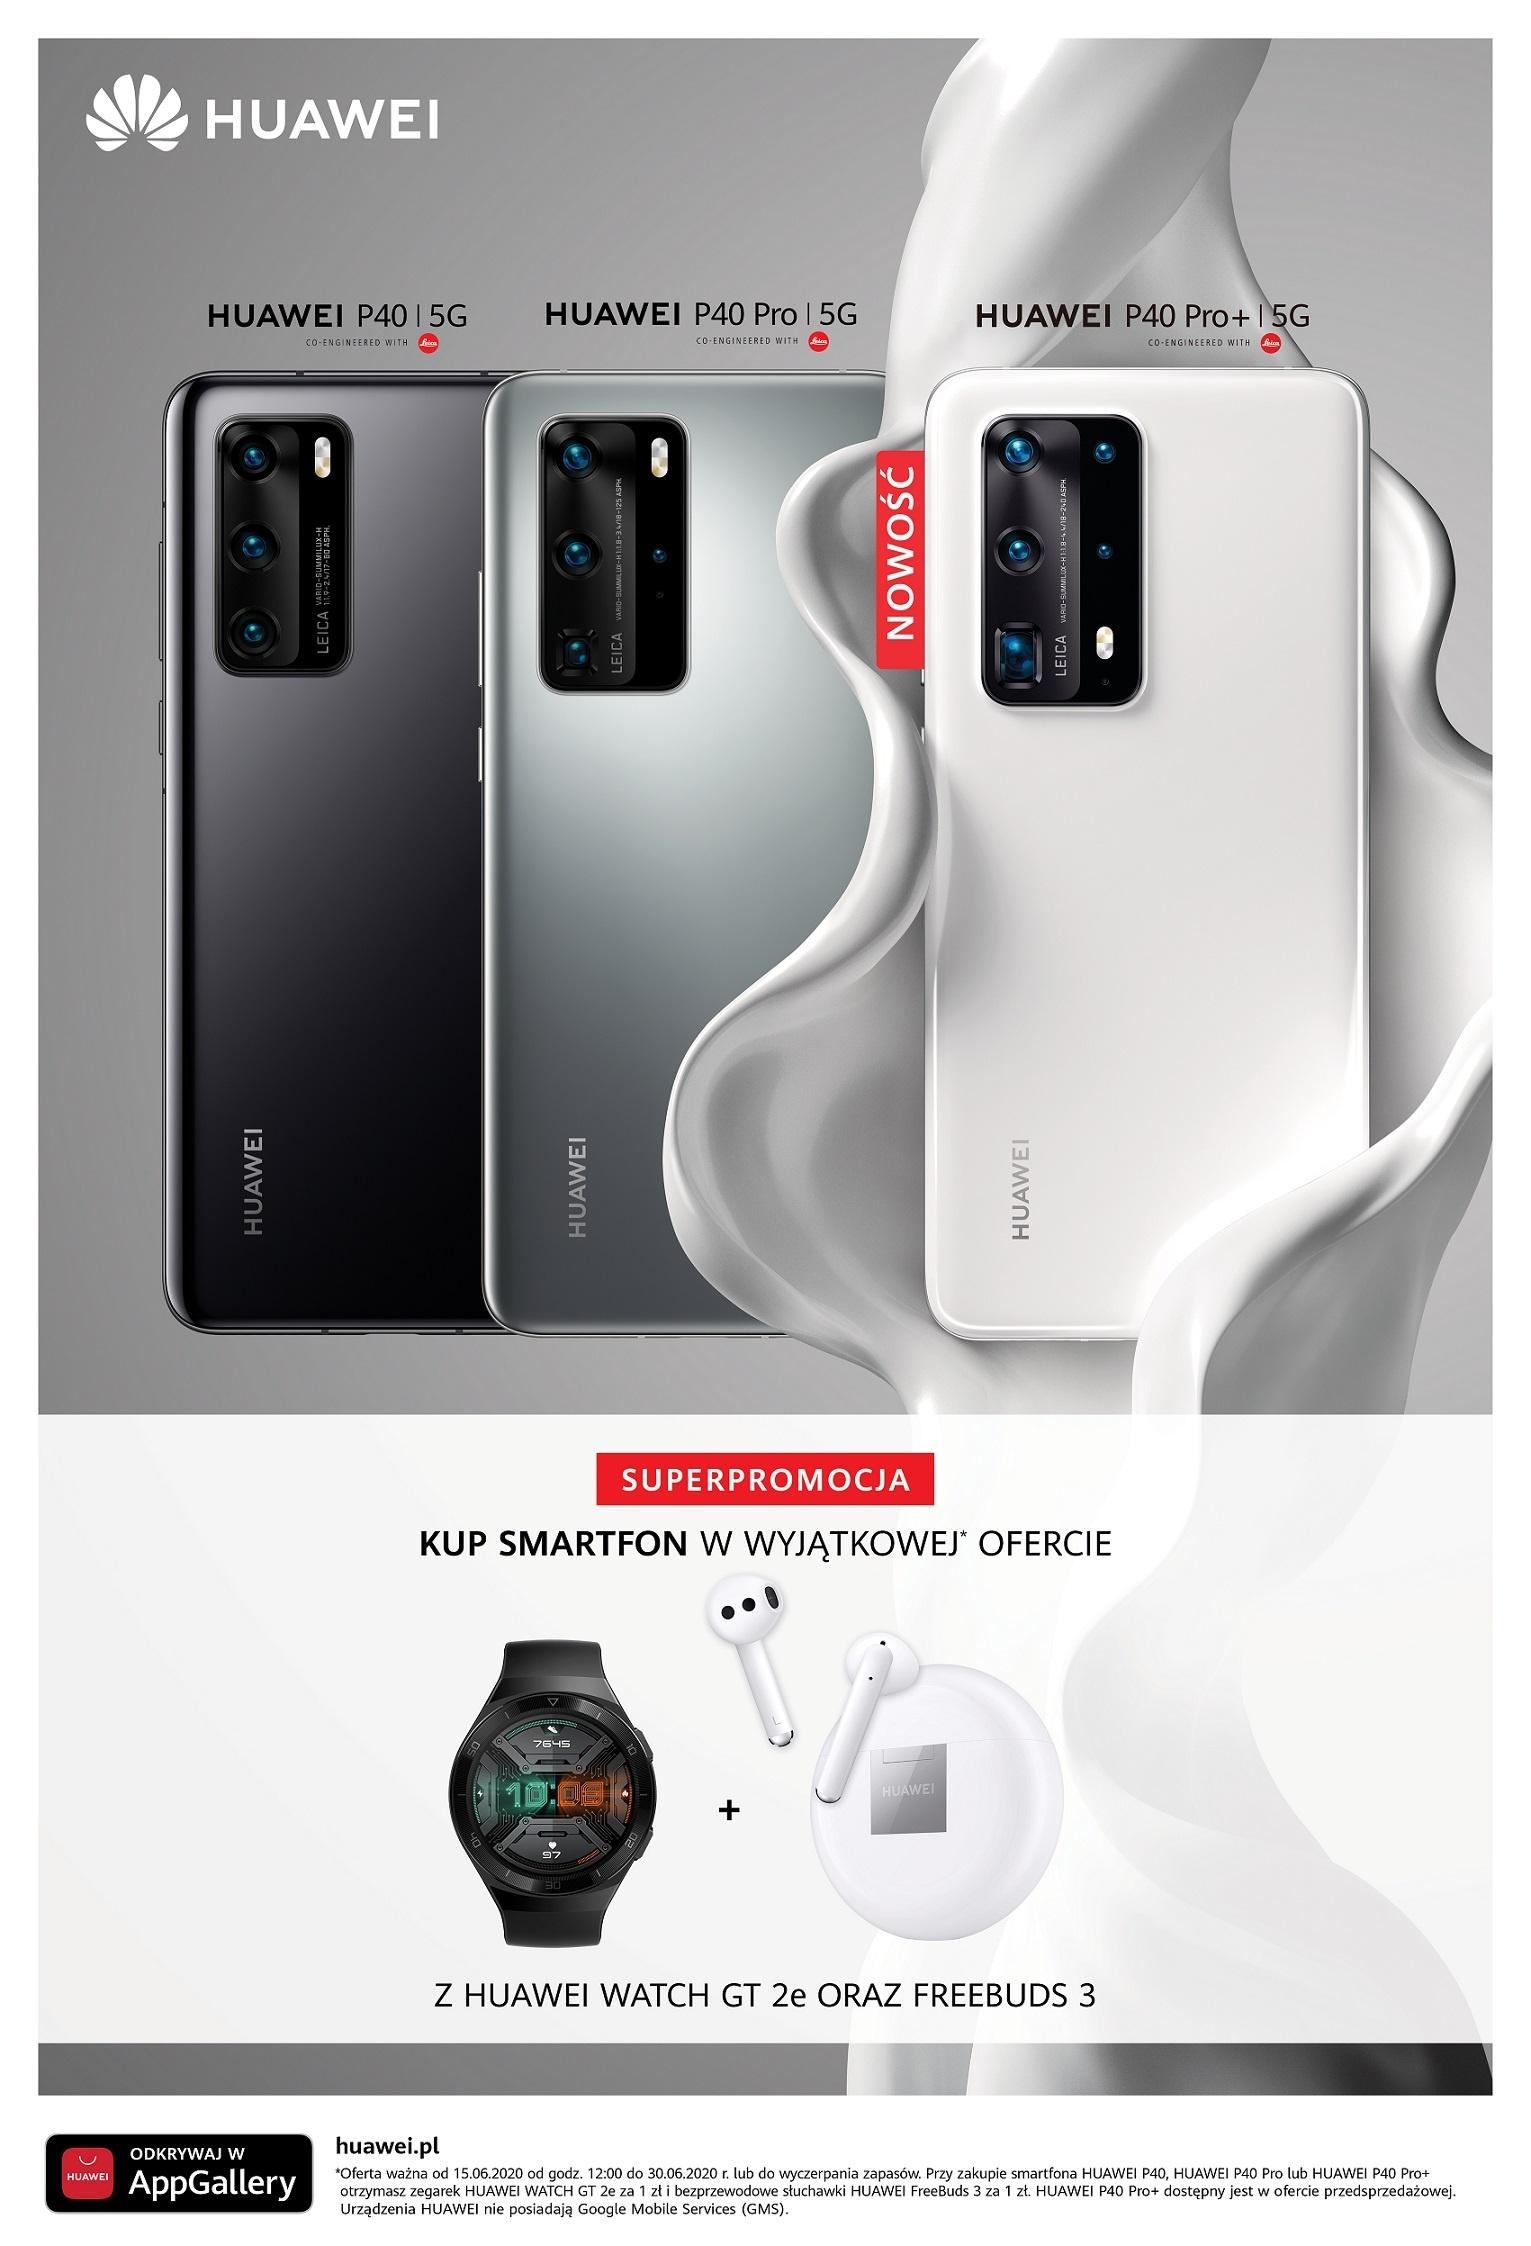 Oferta na serię Huawei P40